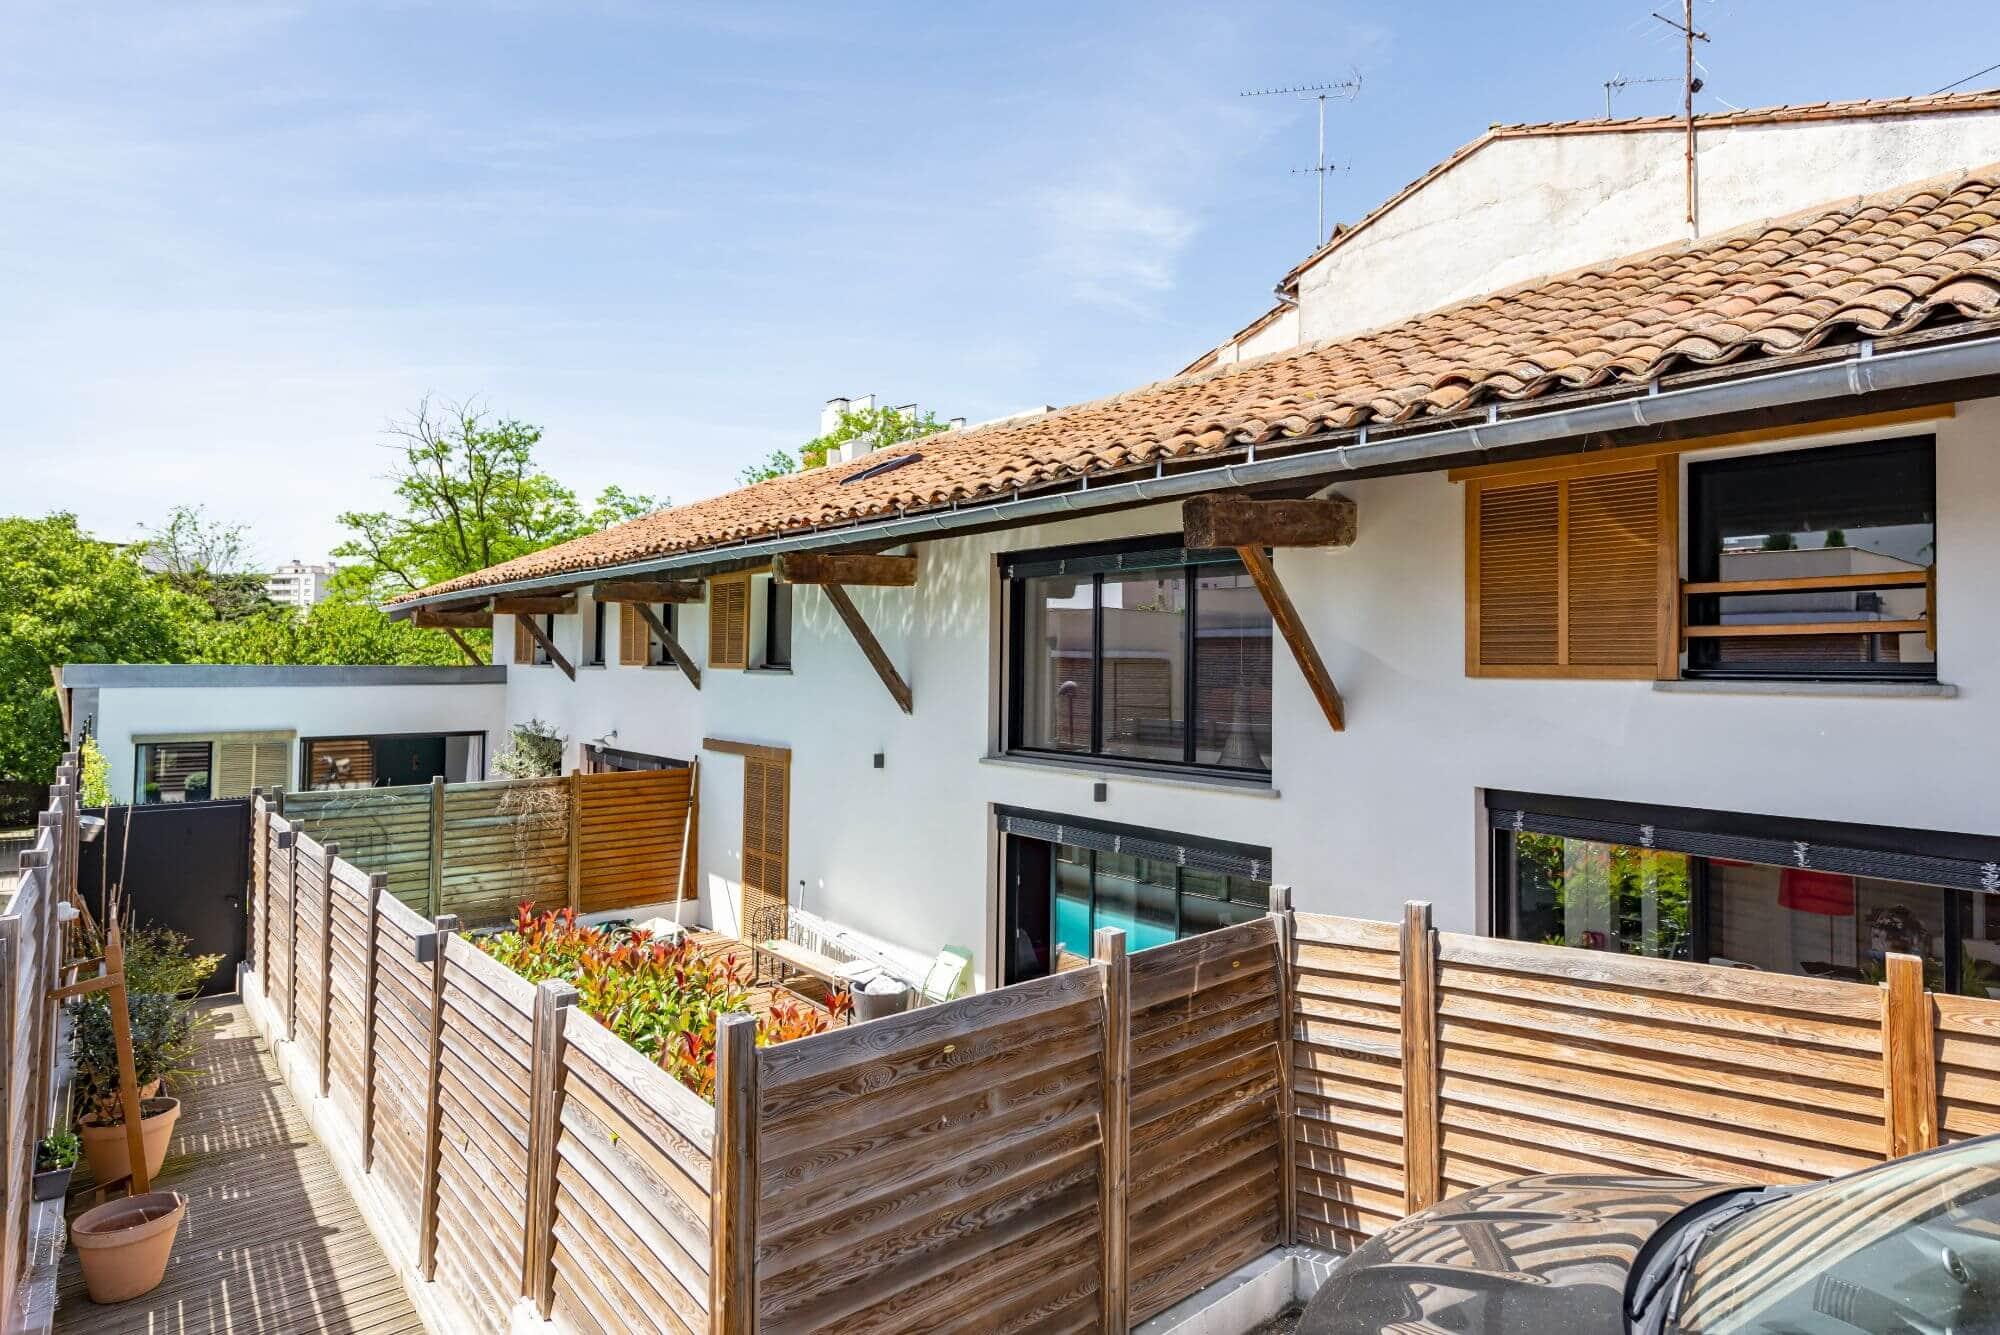 Jardin, Cote Pavee, patio, Piscine